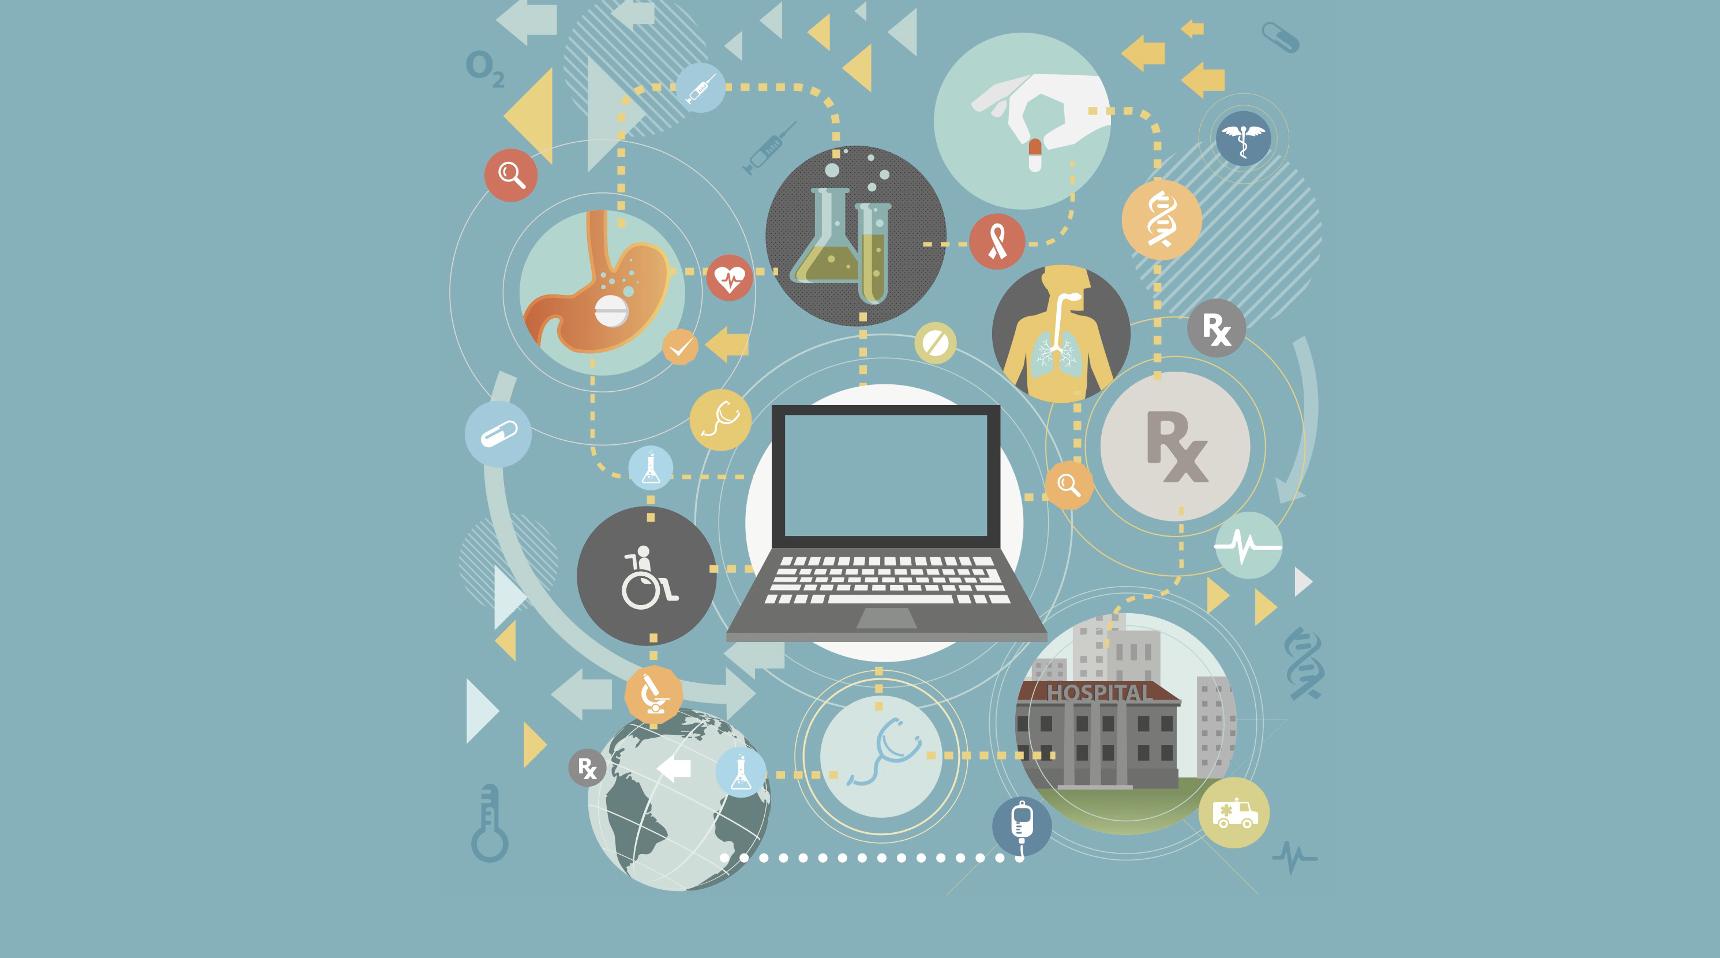 Why Digital Healthcare?